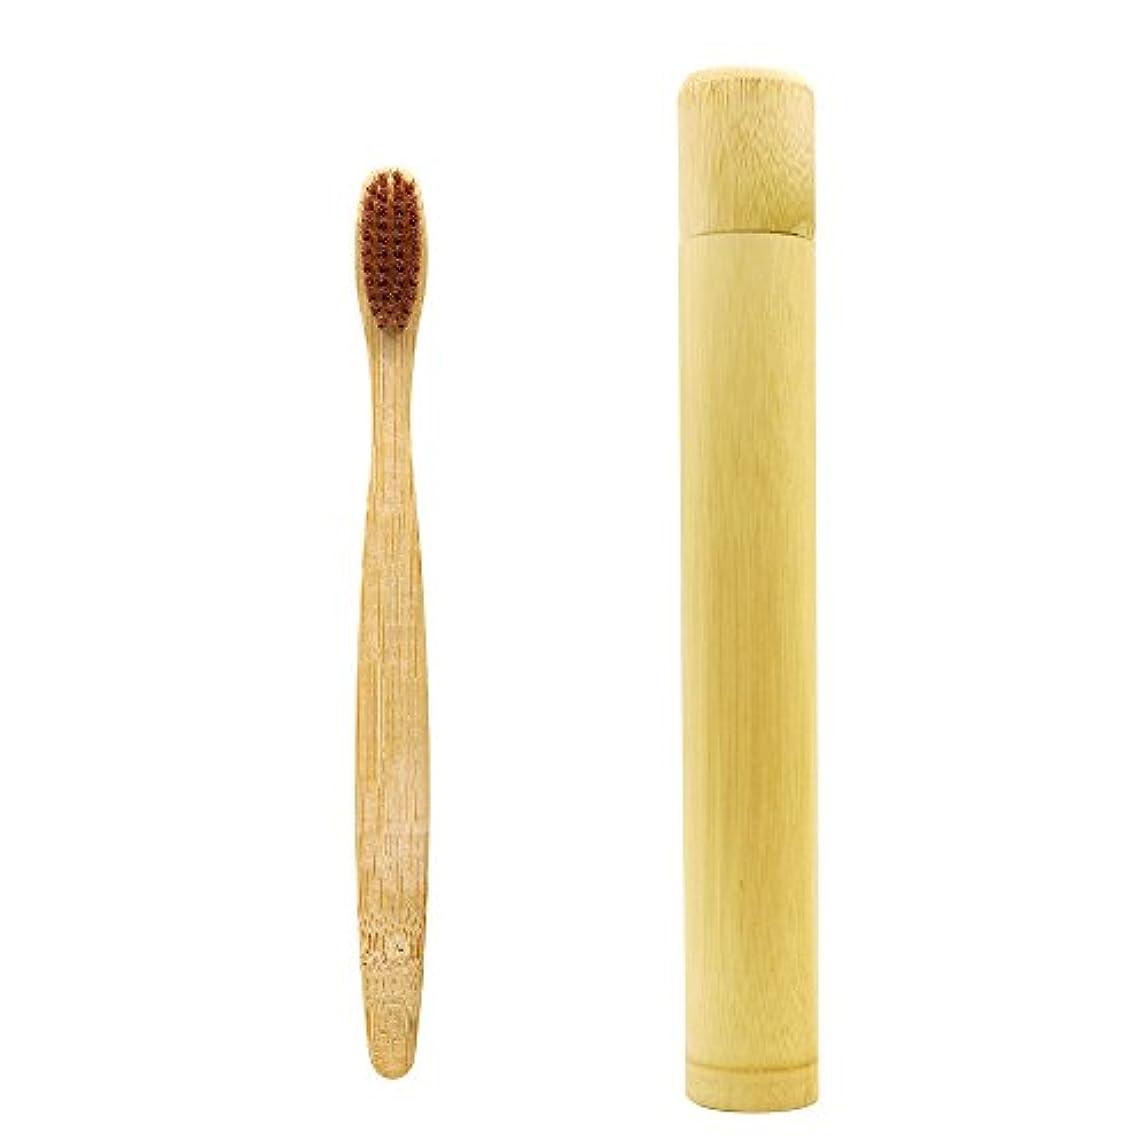 N-amboo 歯ブラシ ケース付き 竹製 耐久性 出張旅行 携帯便利 エコ